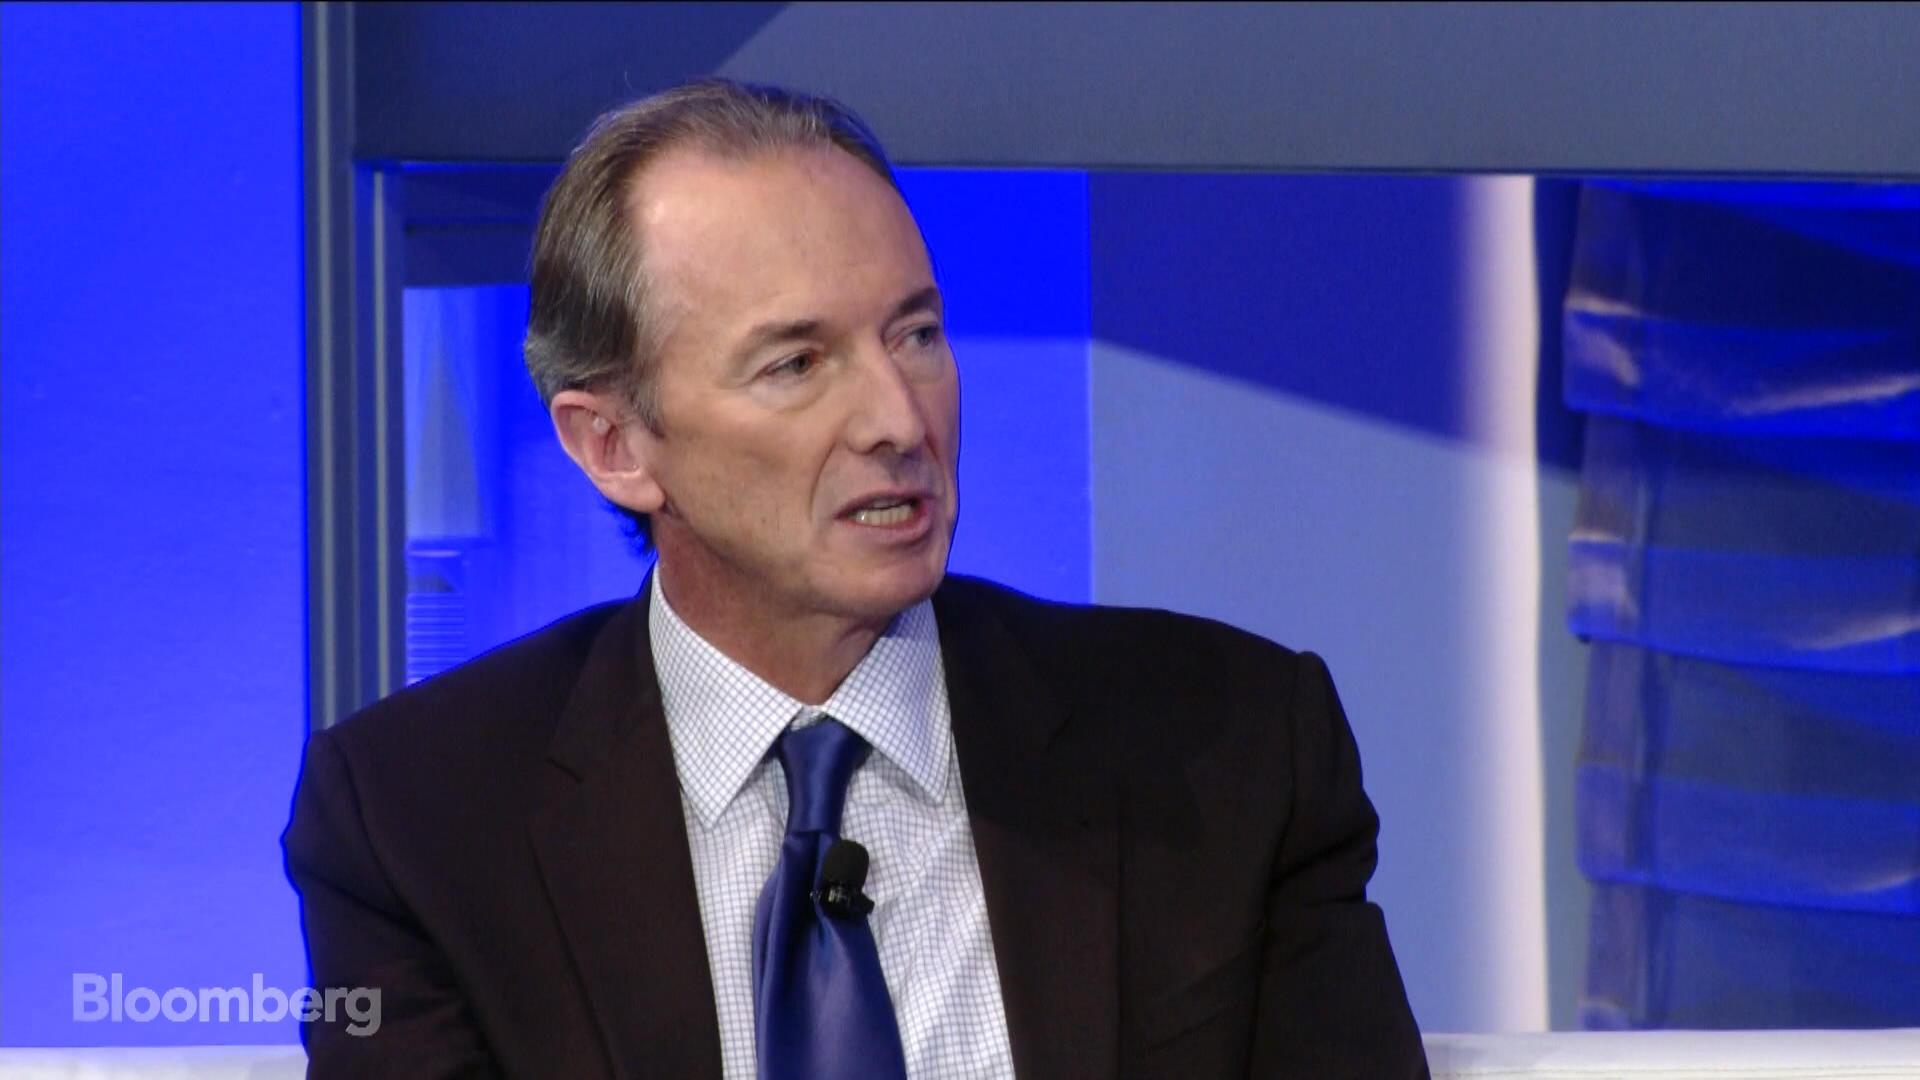 Boeing deepens jetliner job cuts as risk of sales downturn looms bloomberg - Boeing Deepens Jetliner Job Cuts As Risk Of Sales Downturn Looms Bloomberg 77